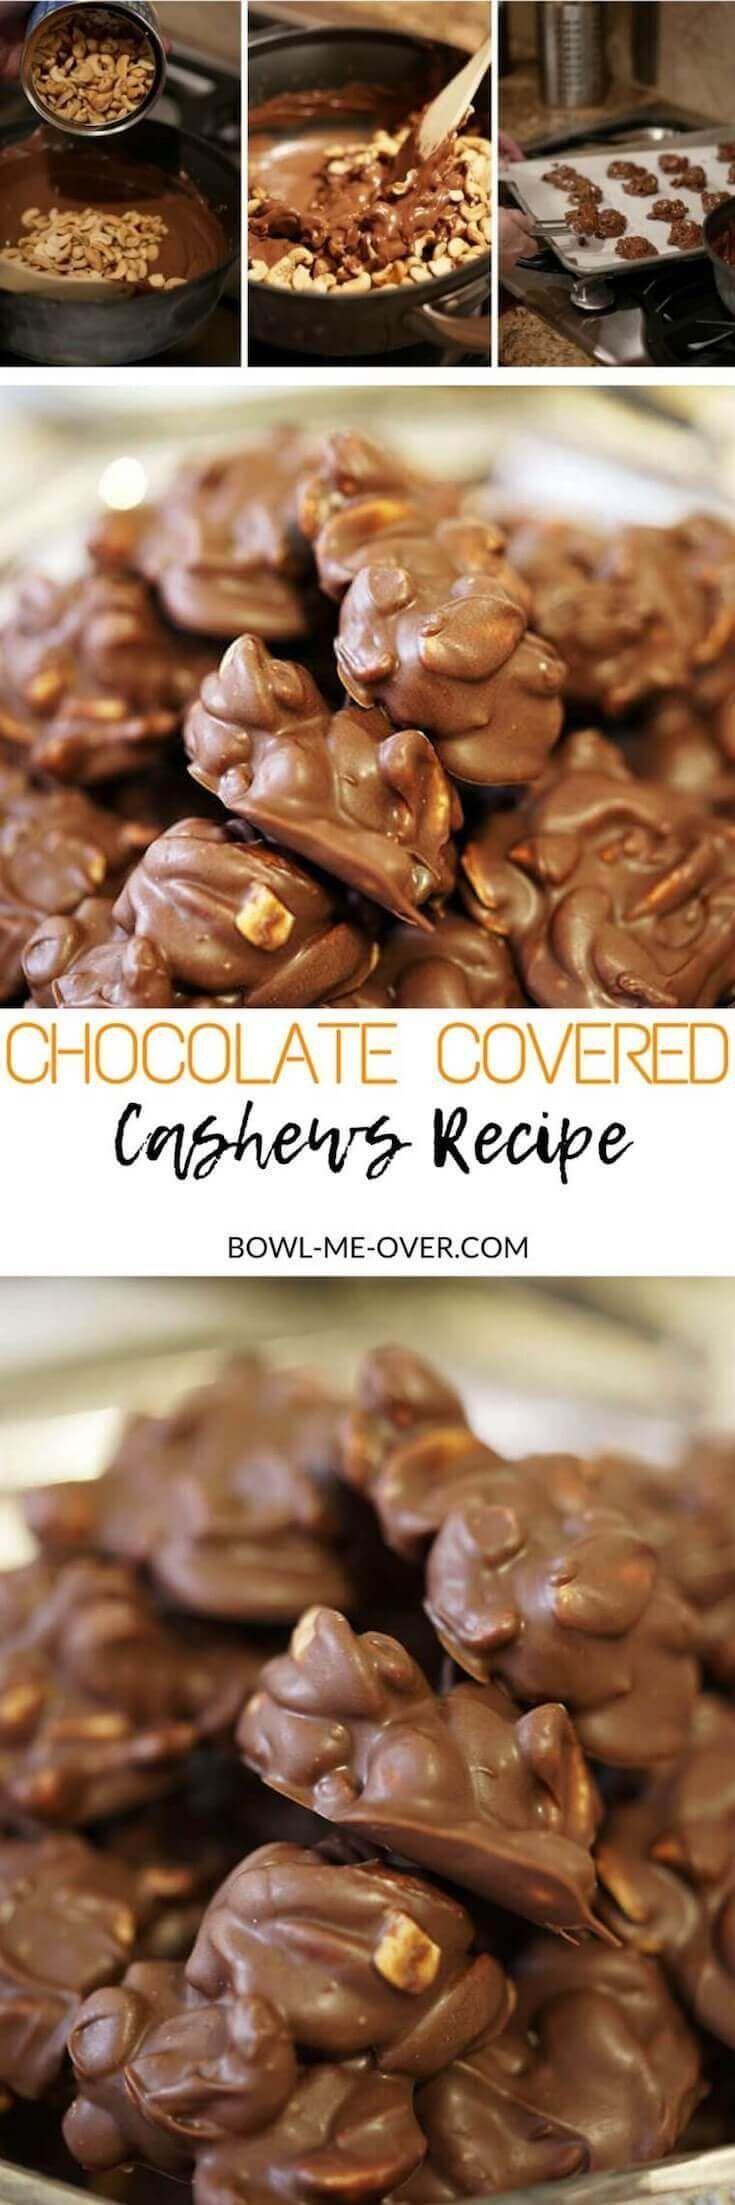 Homemade Chocolate Covered Cashews Recipe Easy Chocolate Salty Nuts With Melty Chocolate Chocolate Covered Cashews Recipe Cashew Recipes Delicious Desserts